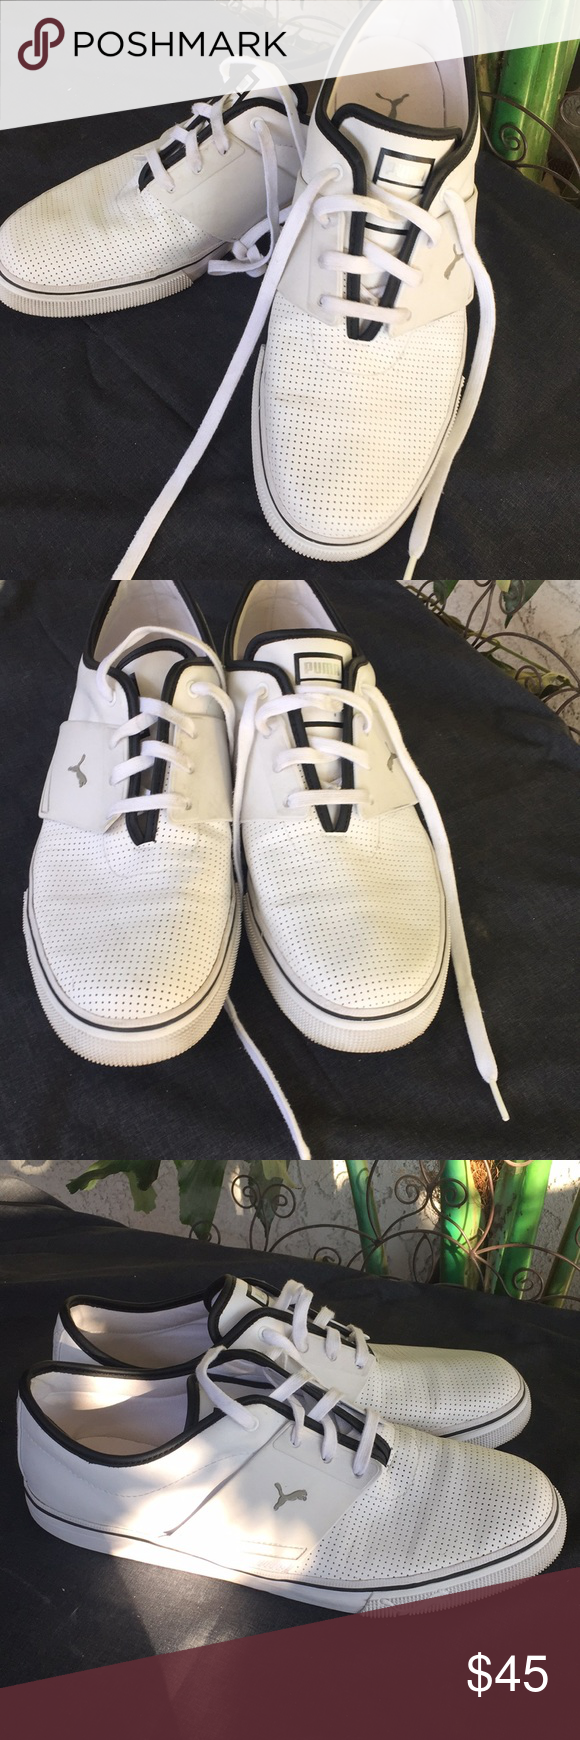 30ac7d8207e PUMA size 12 white   black trim Men s In great condition size 12 Puma Shoes  Athletic